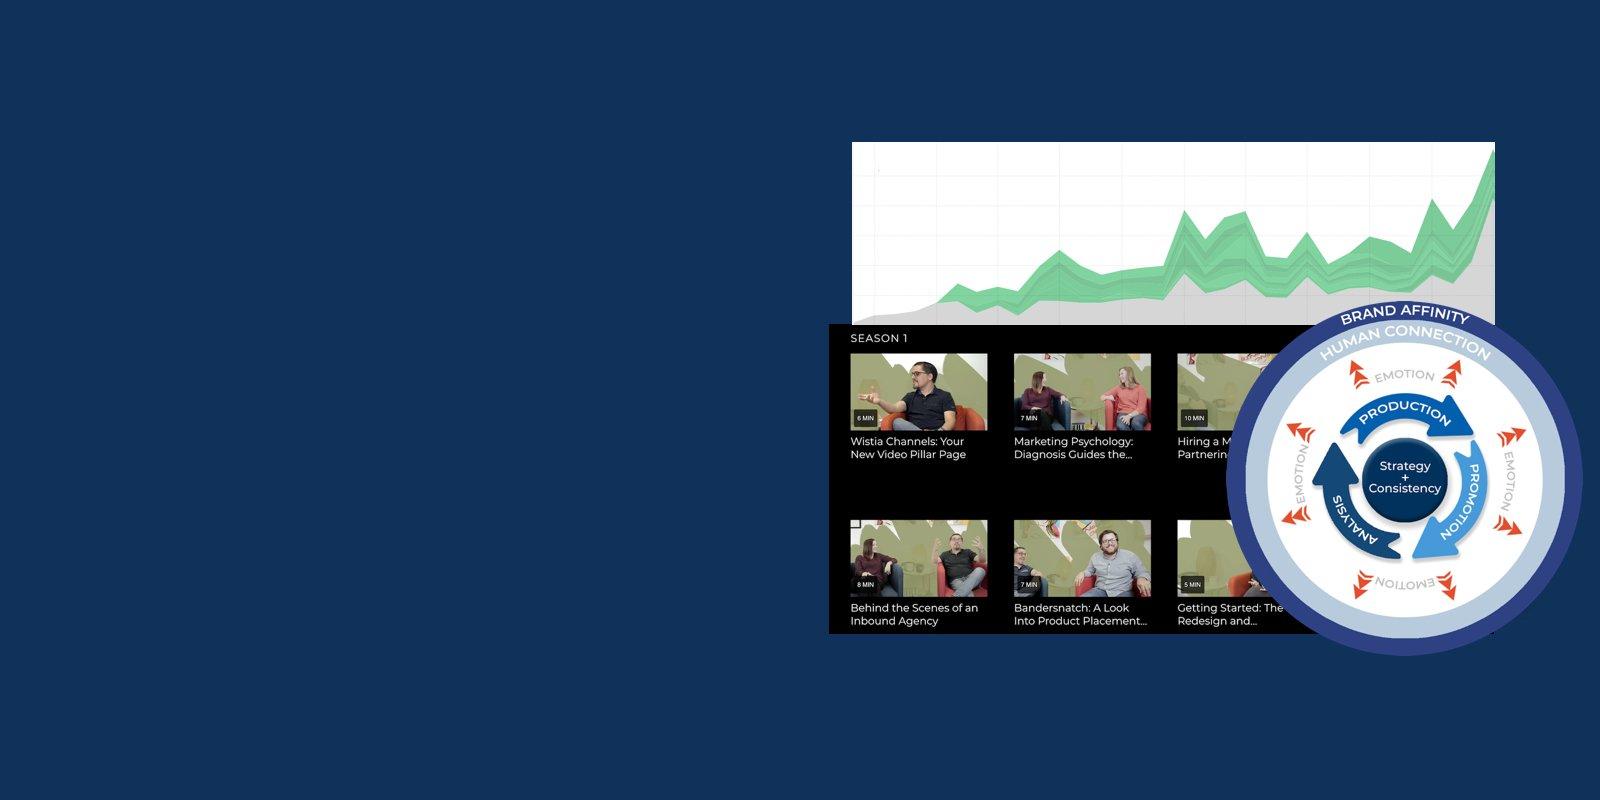 videopillarpage-brand-affinity